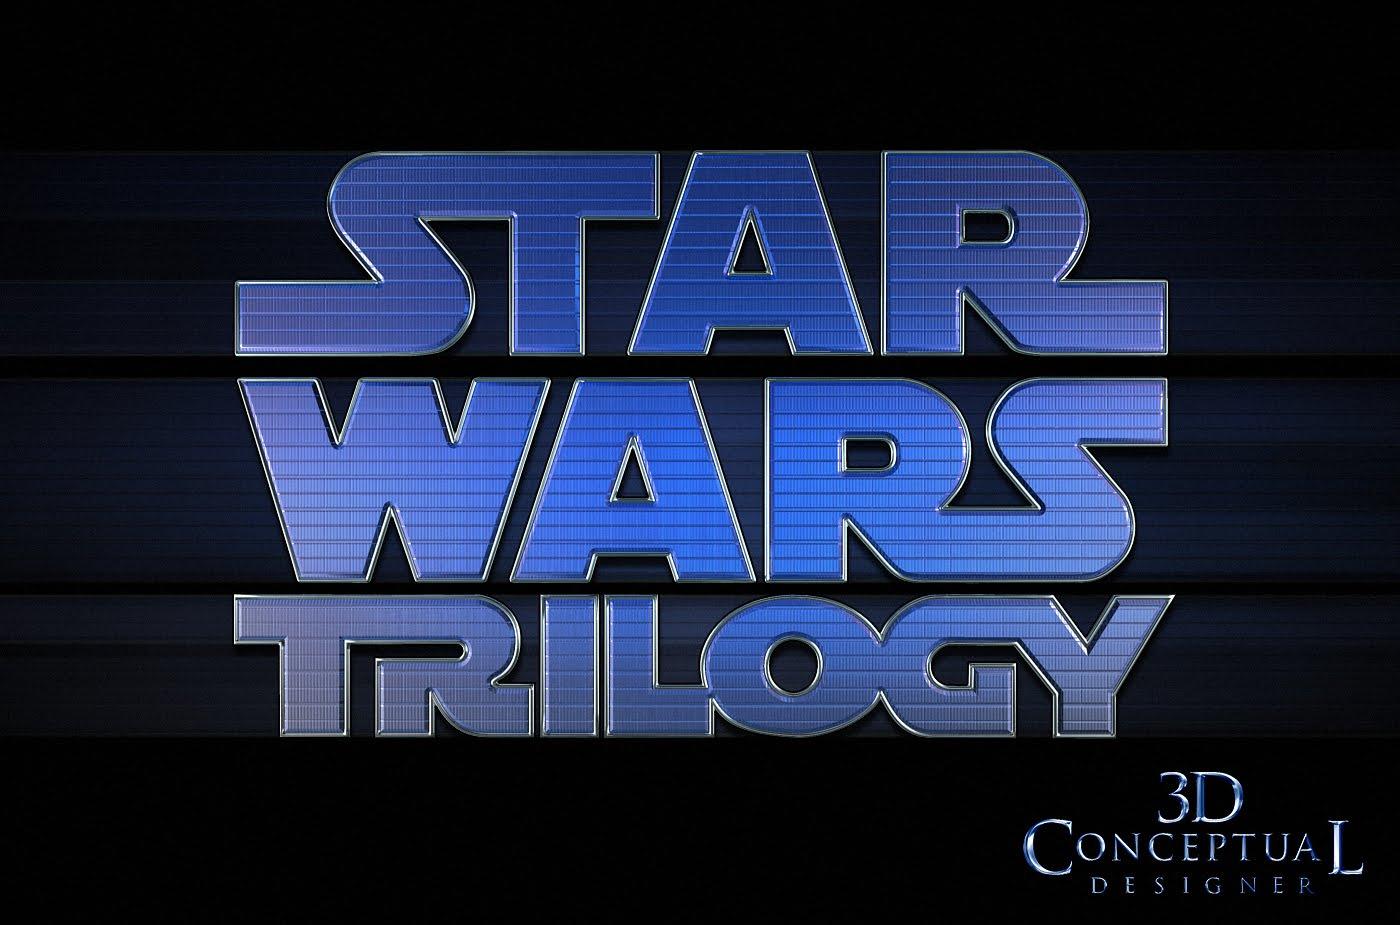 3DconceptualdesignerBlog: Project Review: Star Wars ...